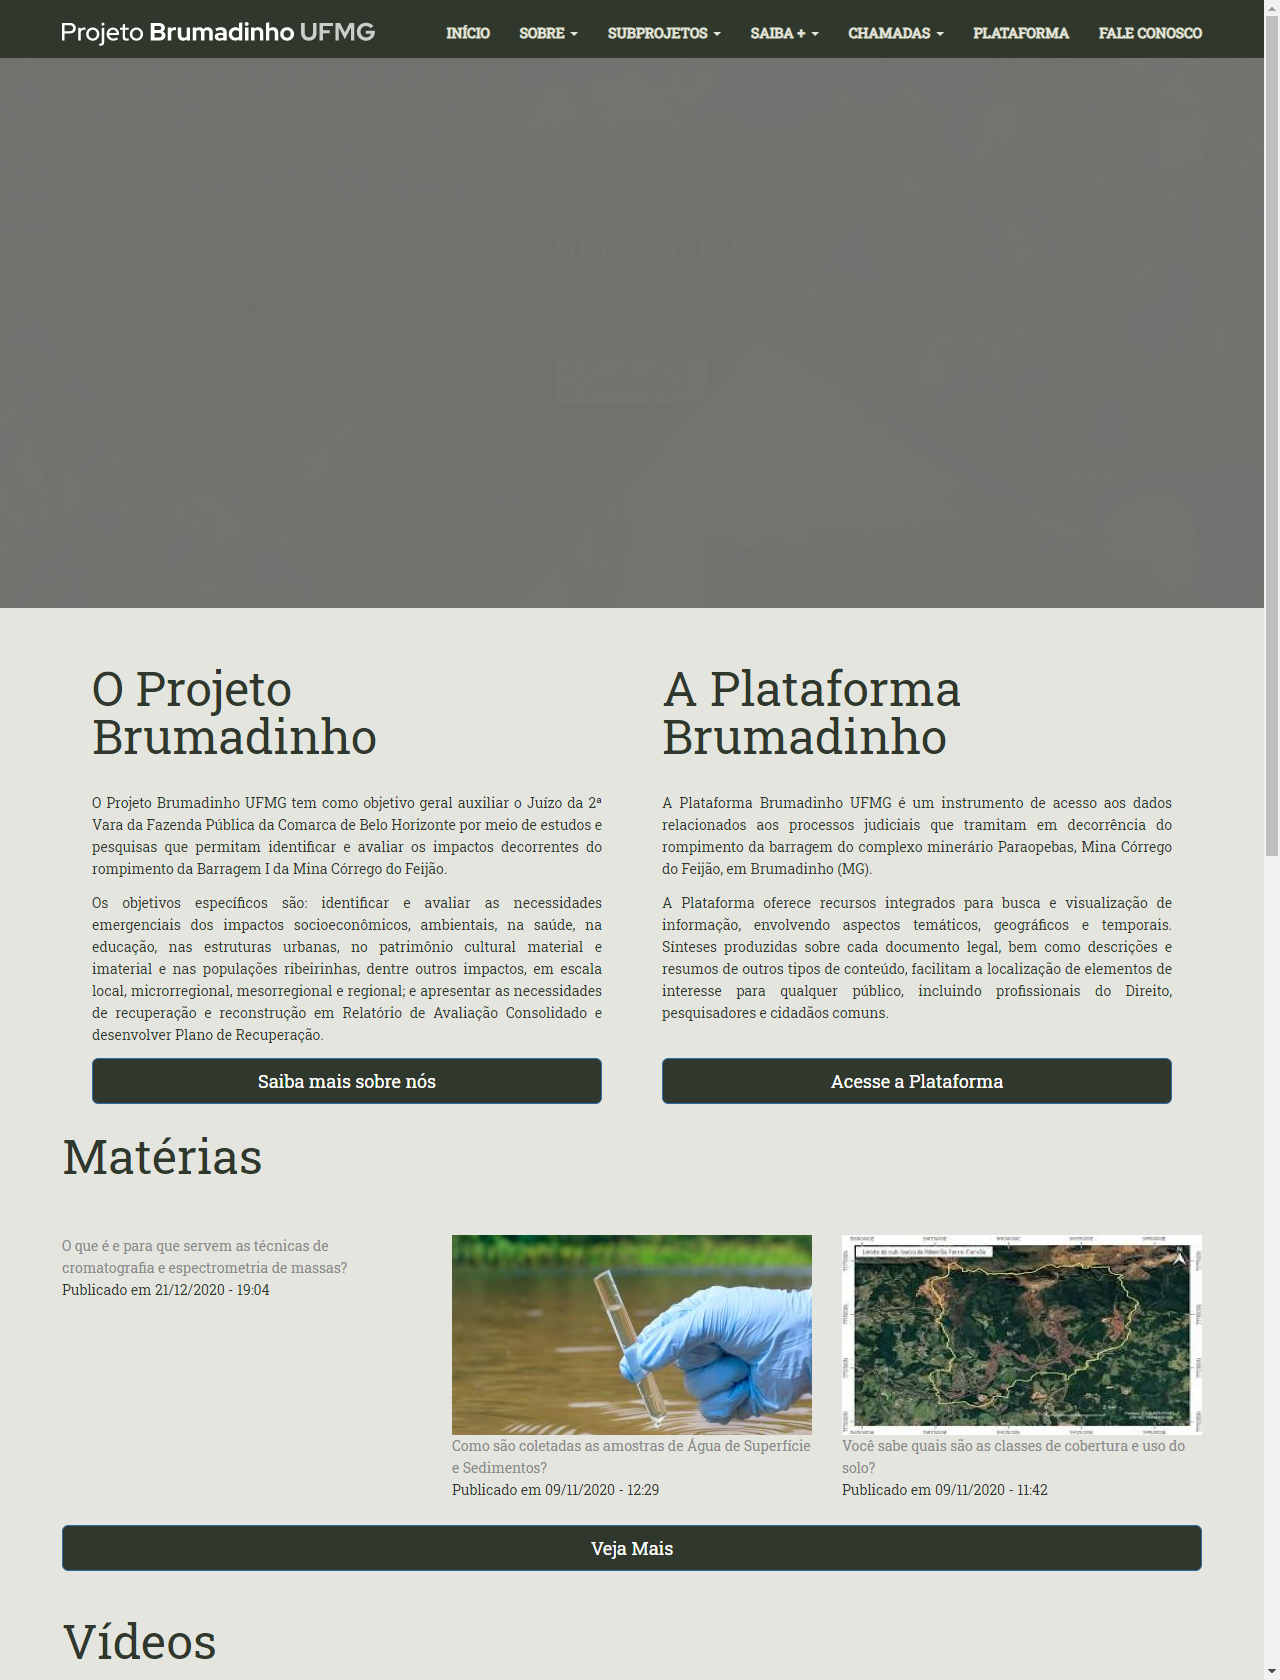 Screenshot Desktop - https://dev.projetobrumadinho.ufmg.br/